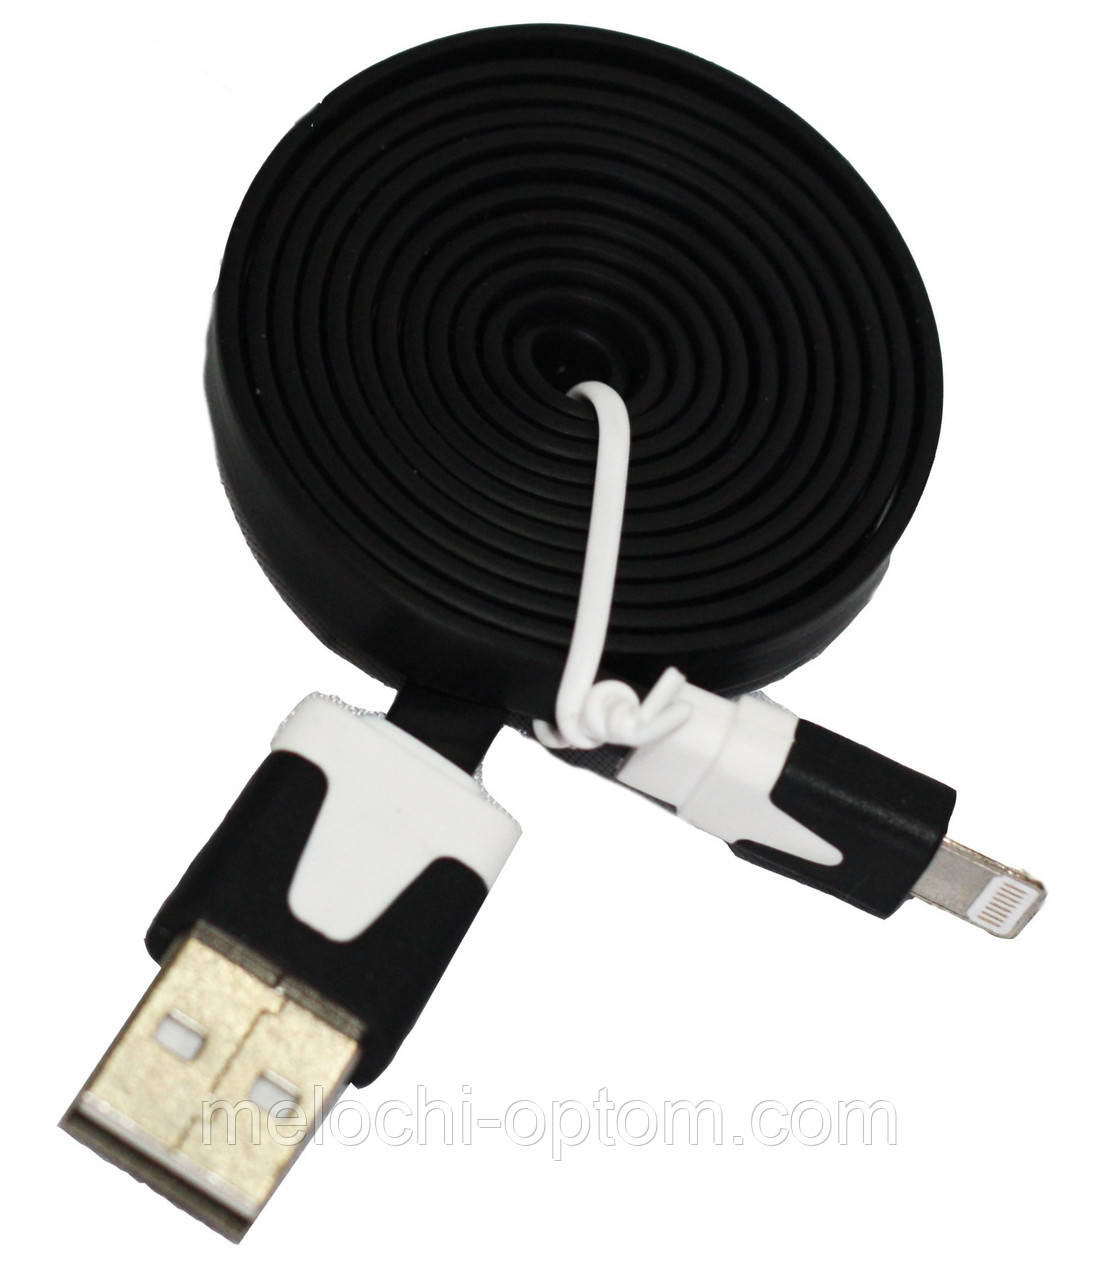 USB кабель для Apple iPhone (100см)